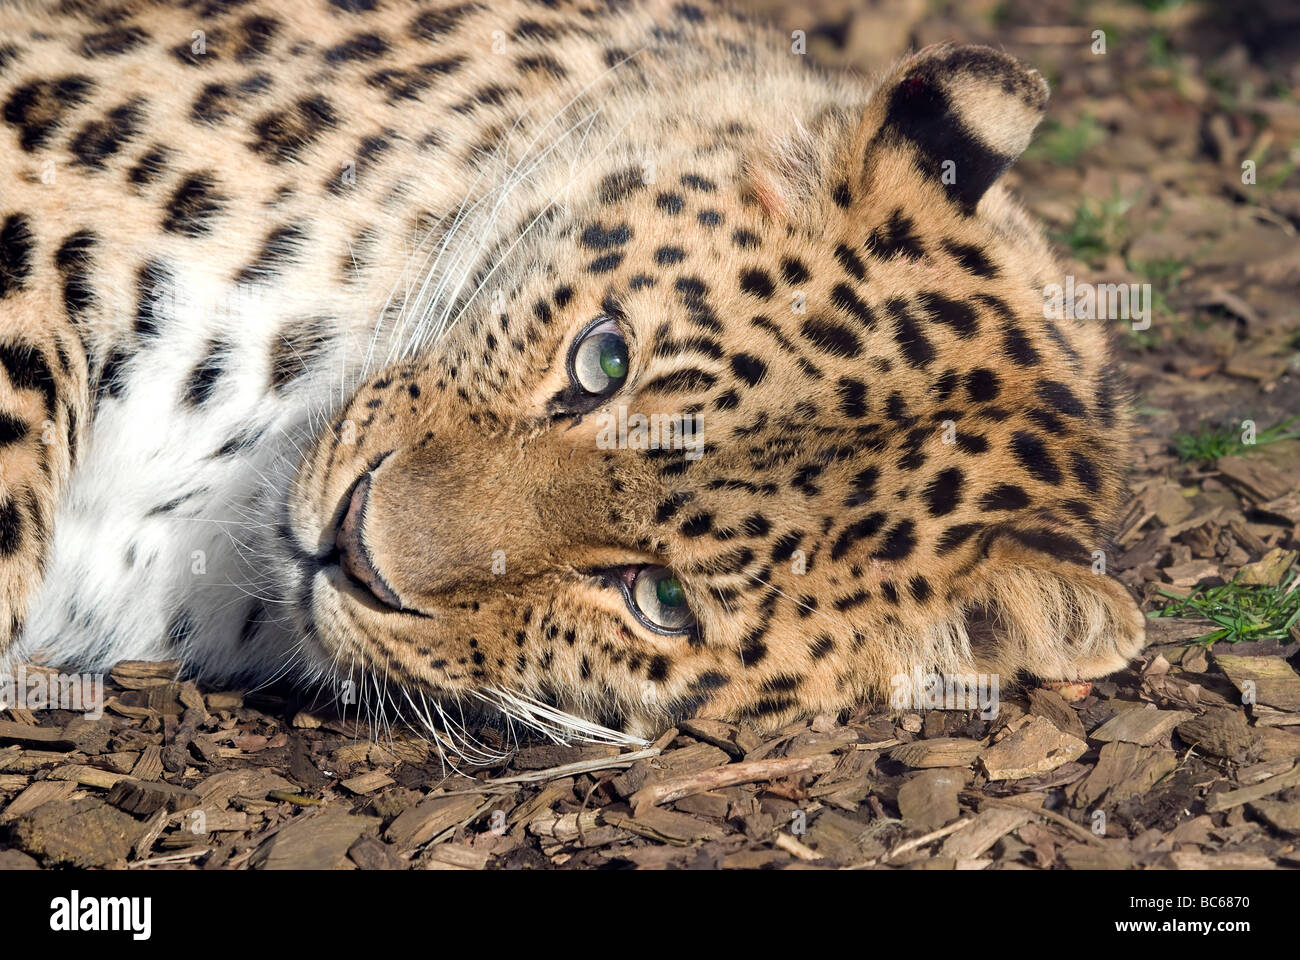 A Shy Looking Amur Leopard - Panthera pardus orientalis - Stock Image